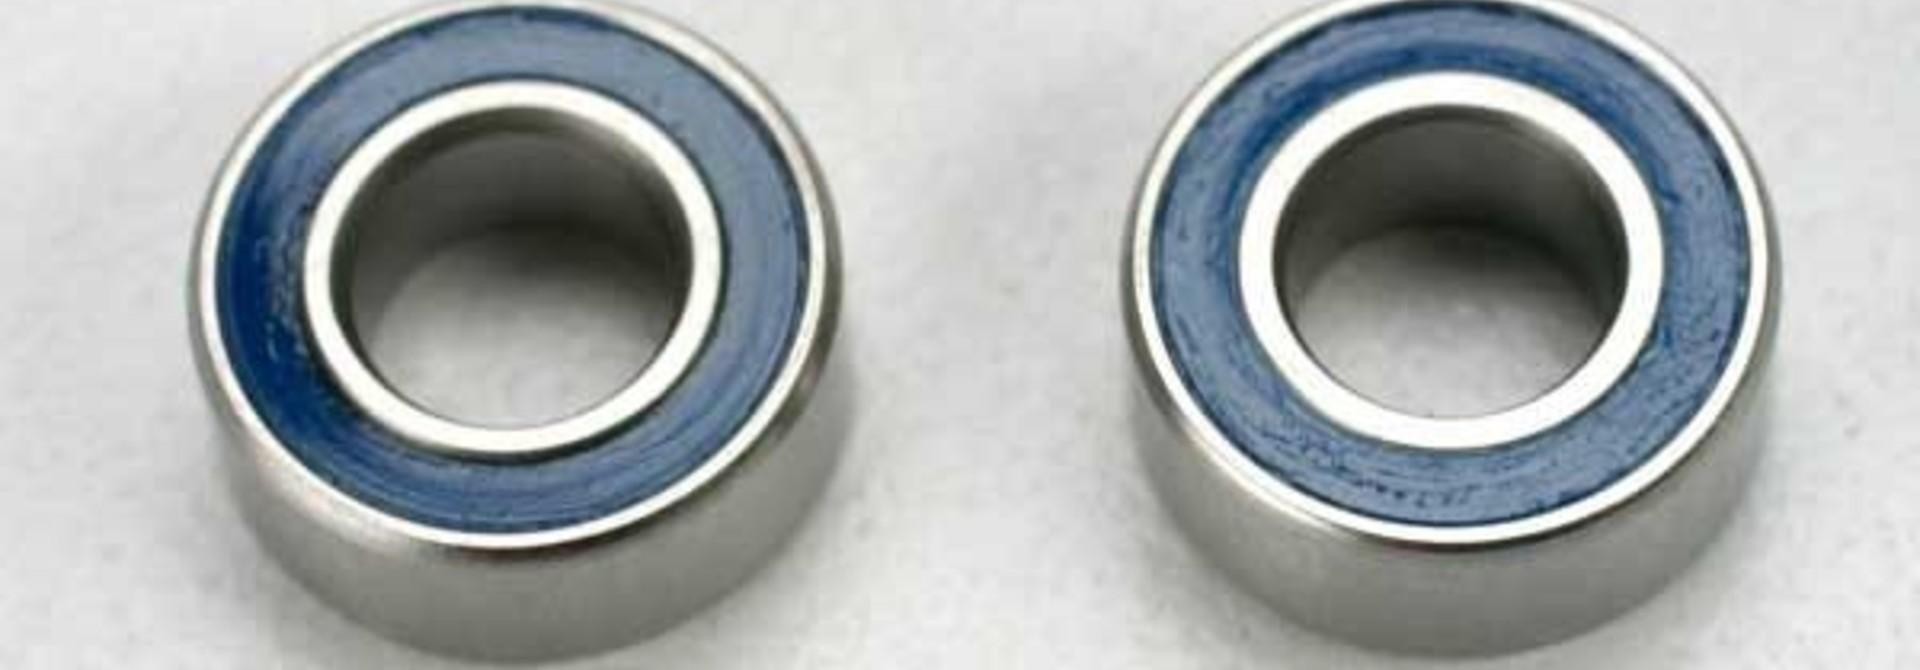 Ball bearings, blue rubber sealed (5x10x4mm) (2), TRX5115